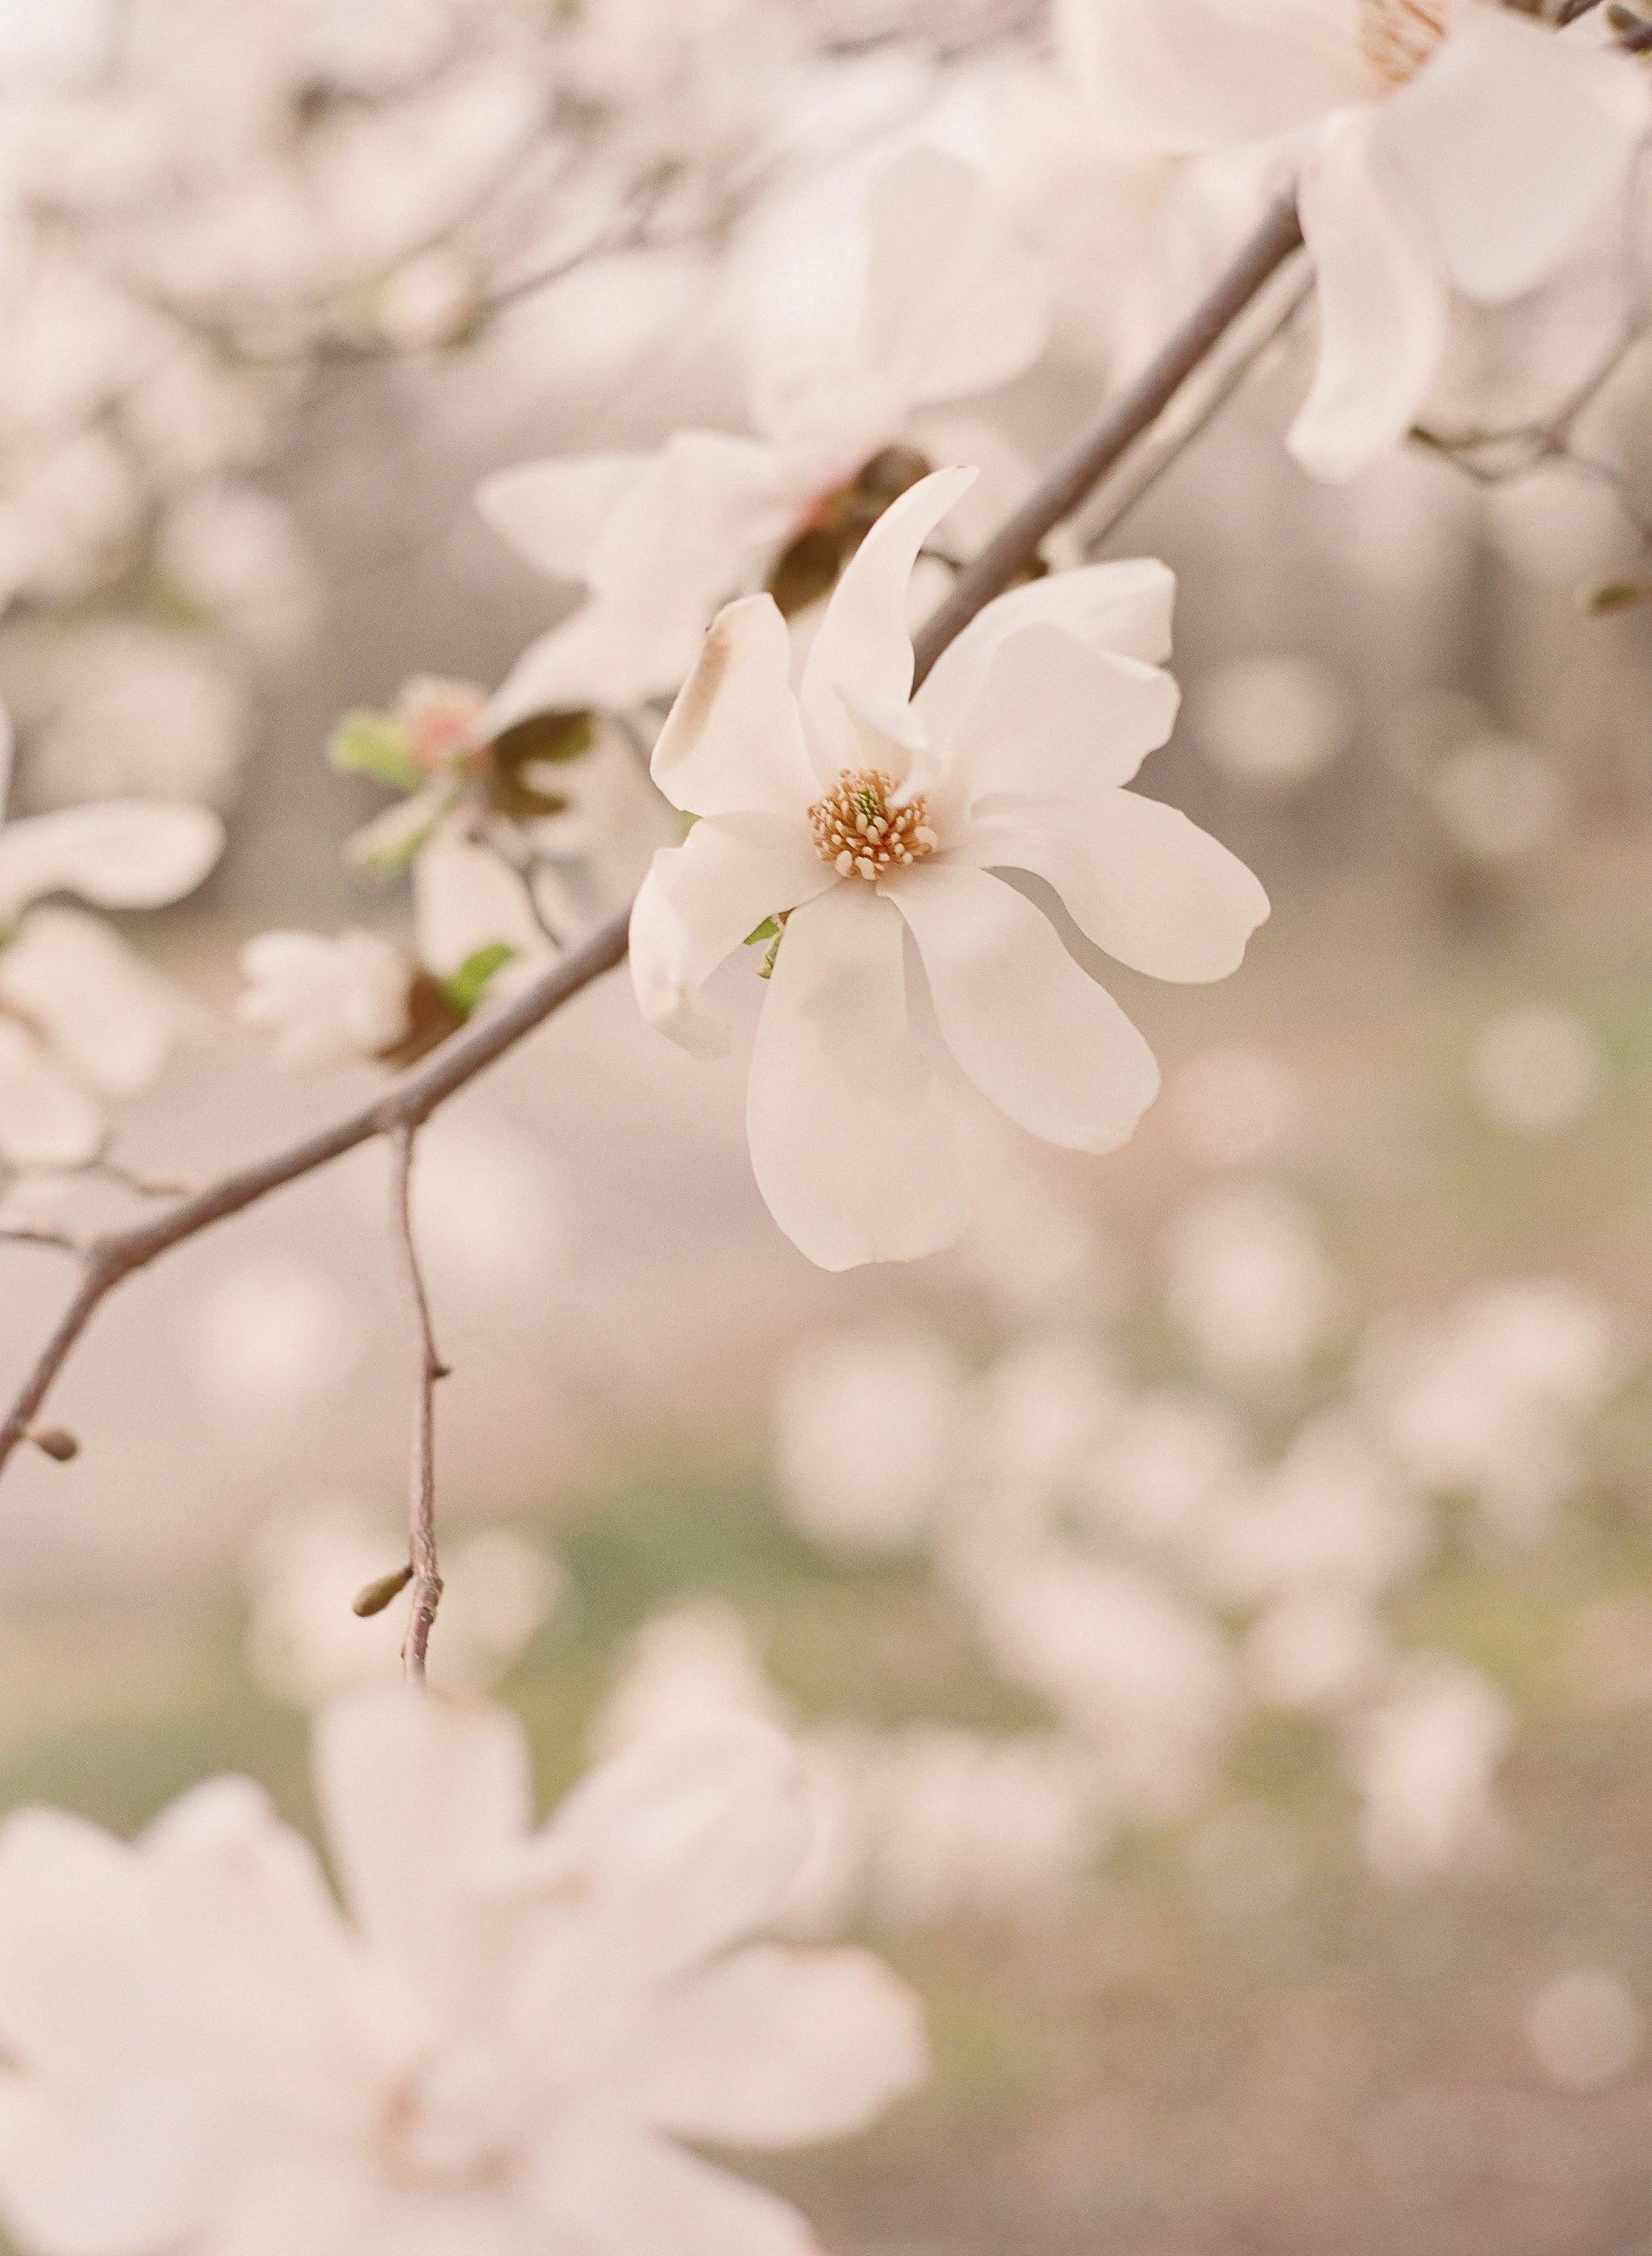 lauramurray-travel-destinationphotography-creativetravel-artists-filmphotography-unearthingtc-magnoliabloom-tree-bloomingtree-spring.jpg